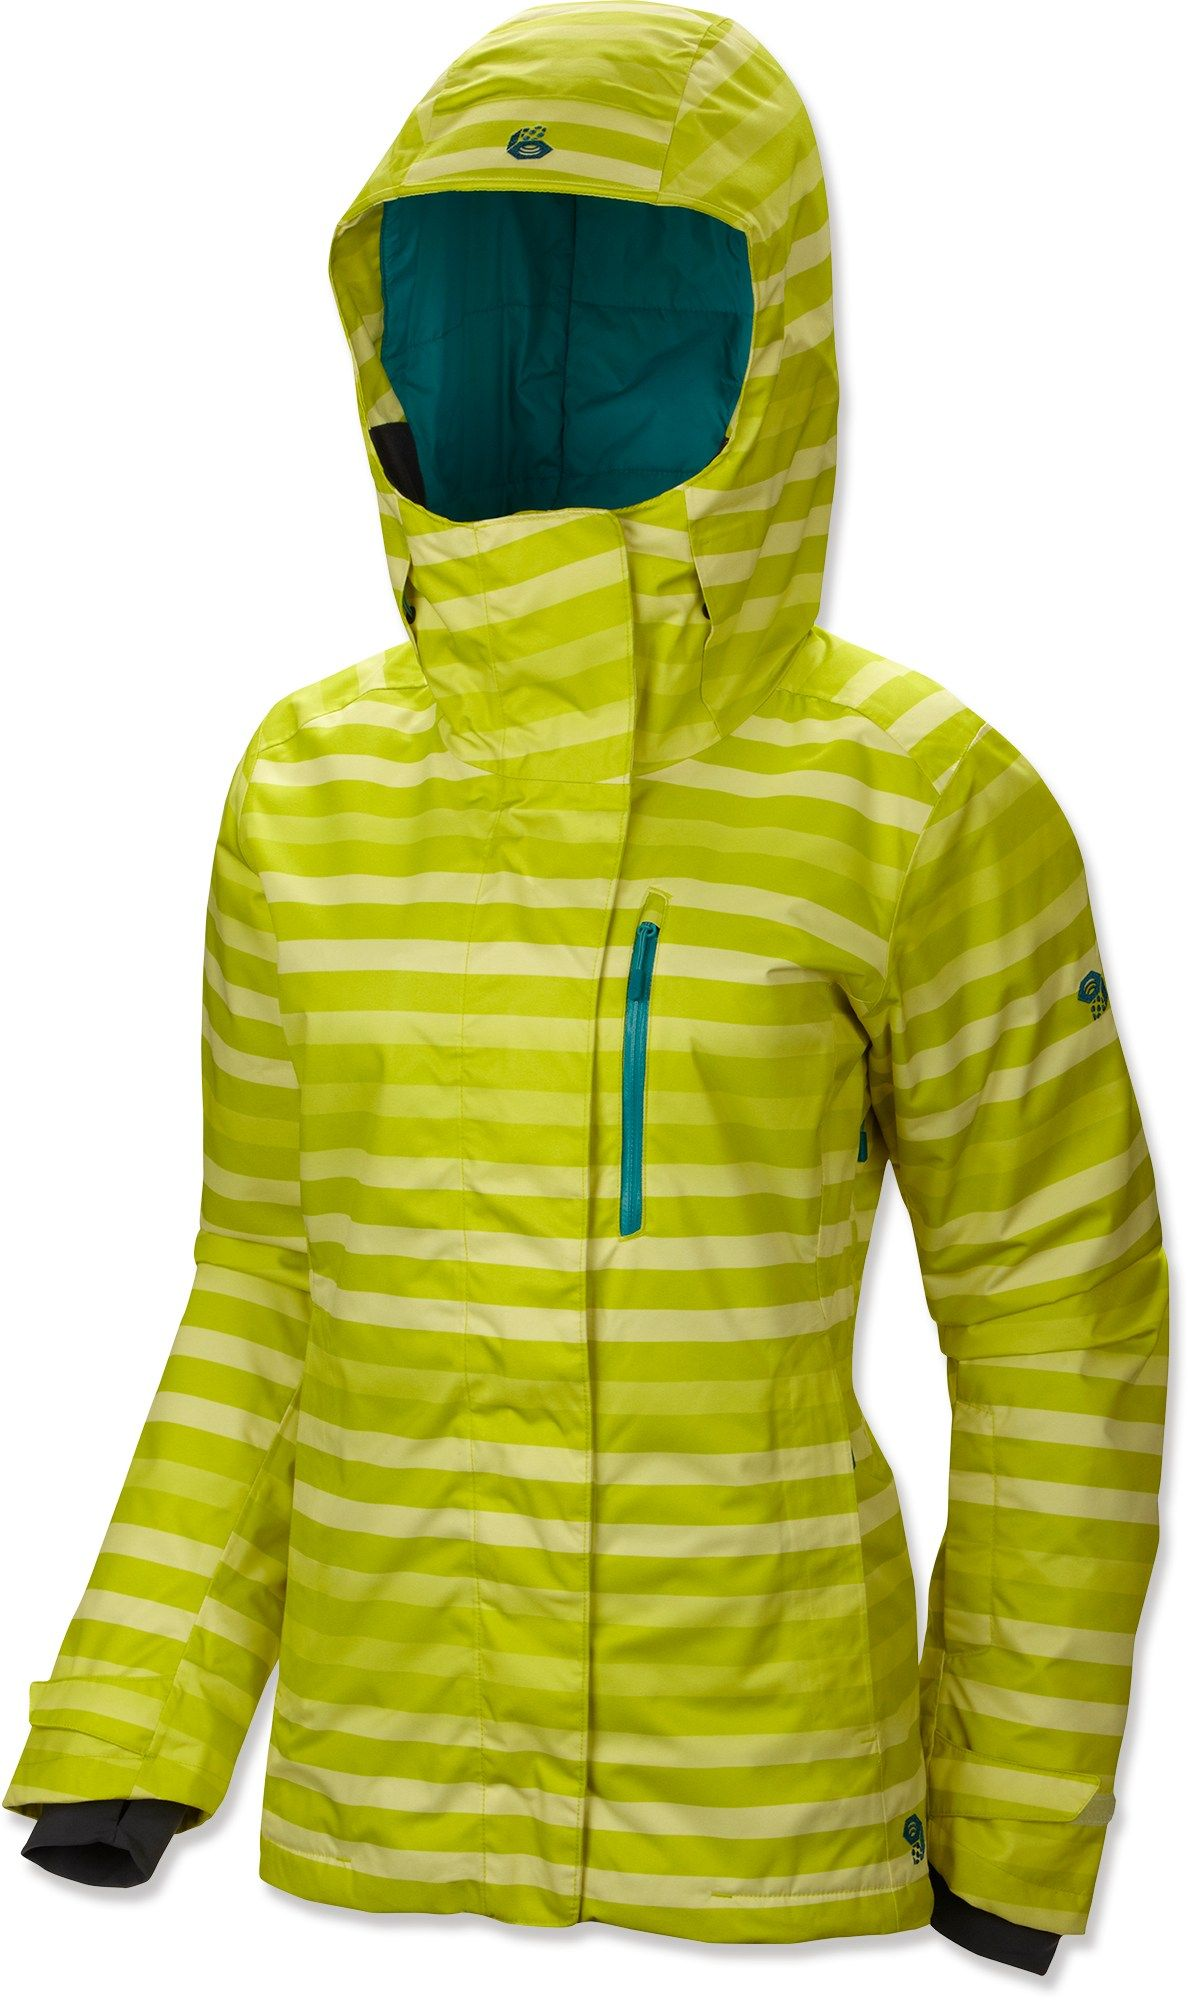 848cf9001 Barnsie Insulated Jacket - Women's | Snowbunny | Jackets for women ...